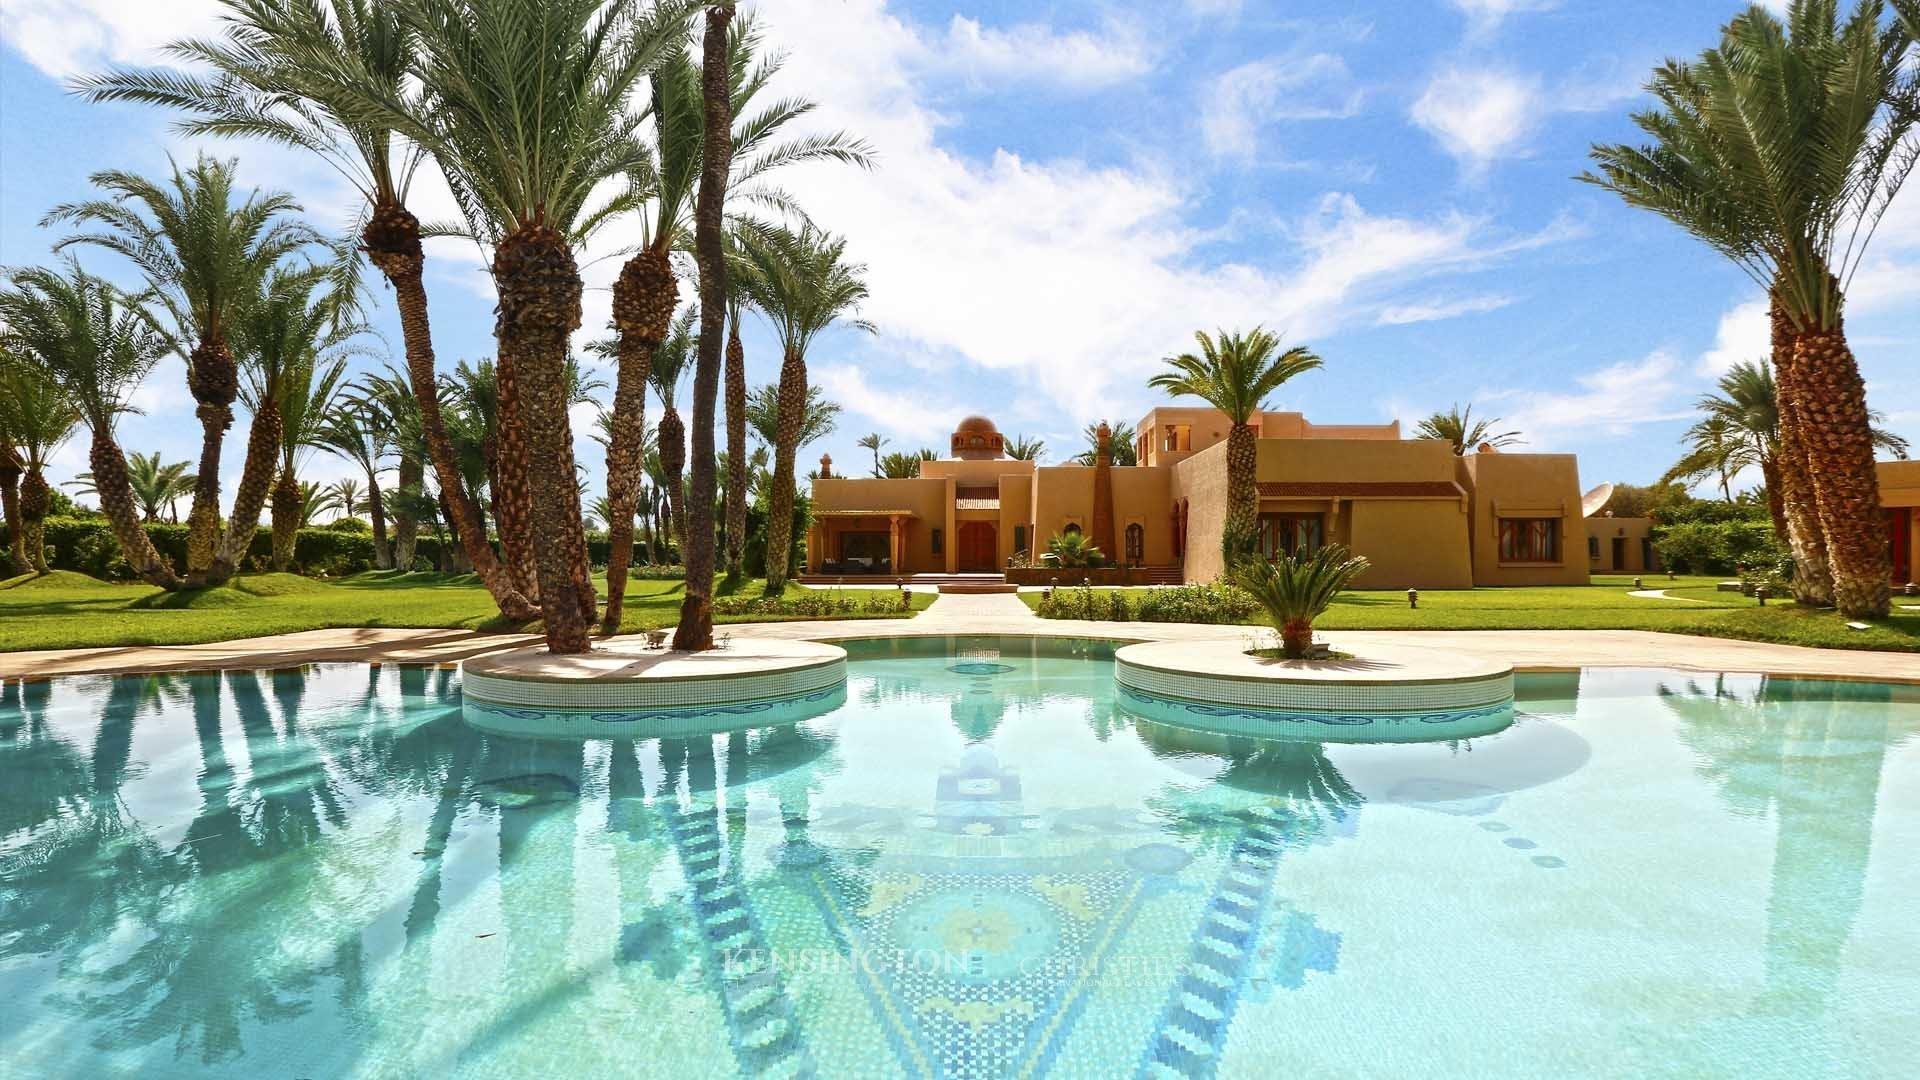 KPPM01293: Villa Mejjat Luxury Villa Marrakech Morocco